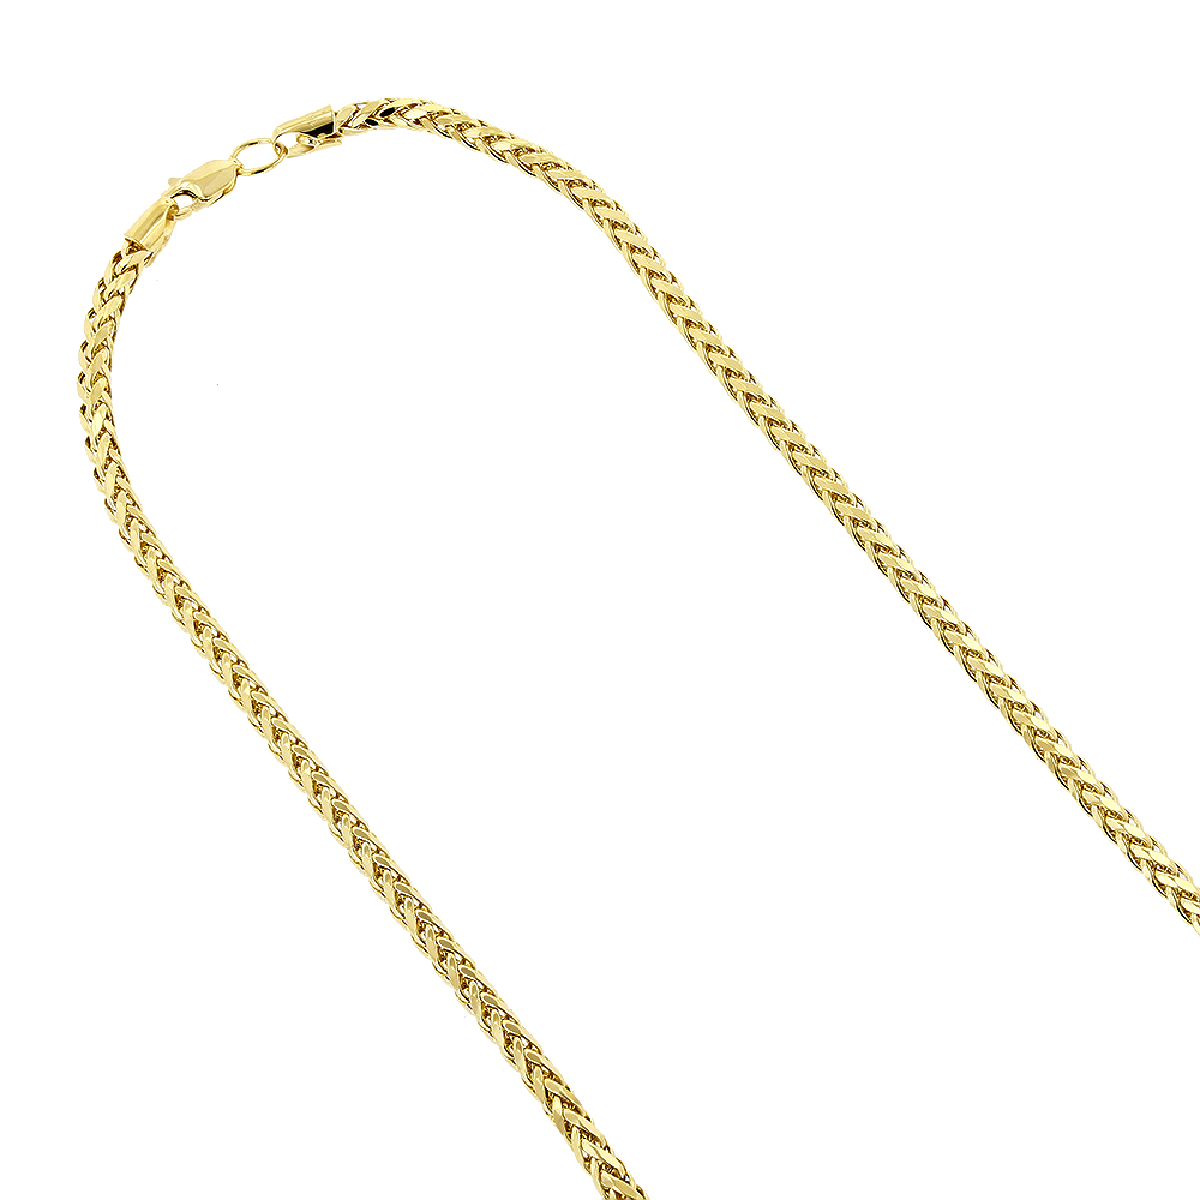 Hollow 14k Gold Franco Chain For Men & Women Round Diamond Cut 3mm